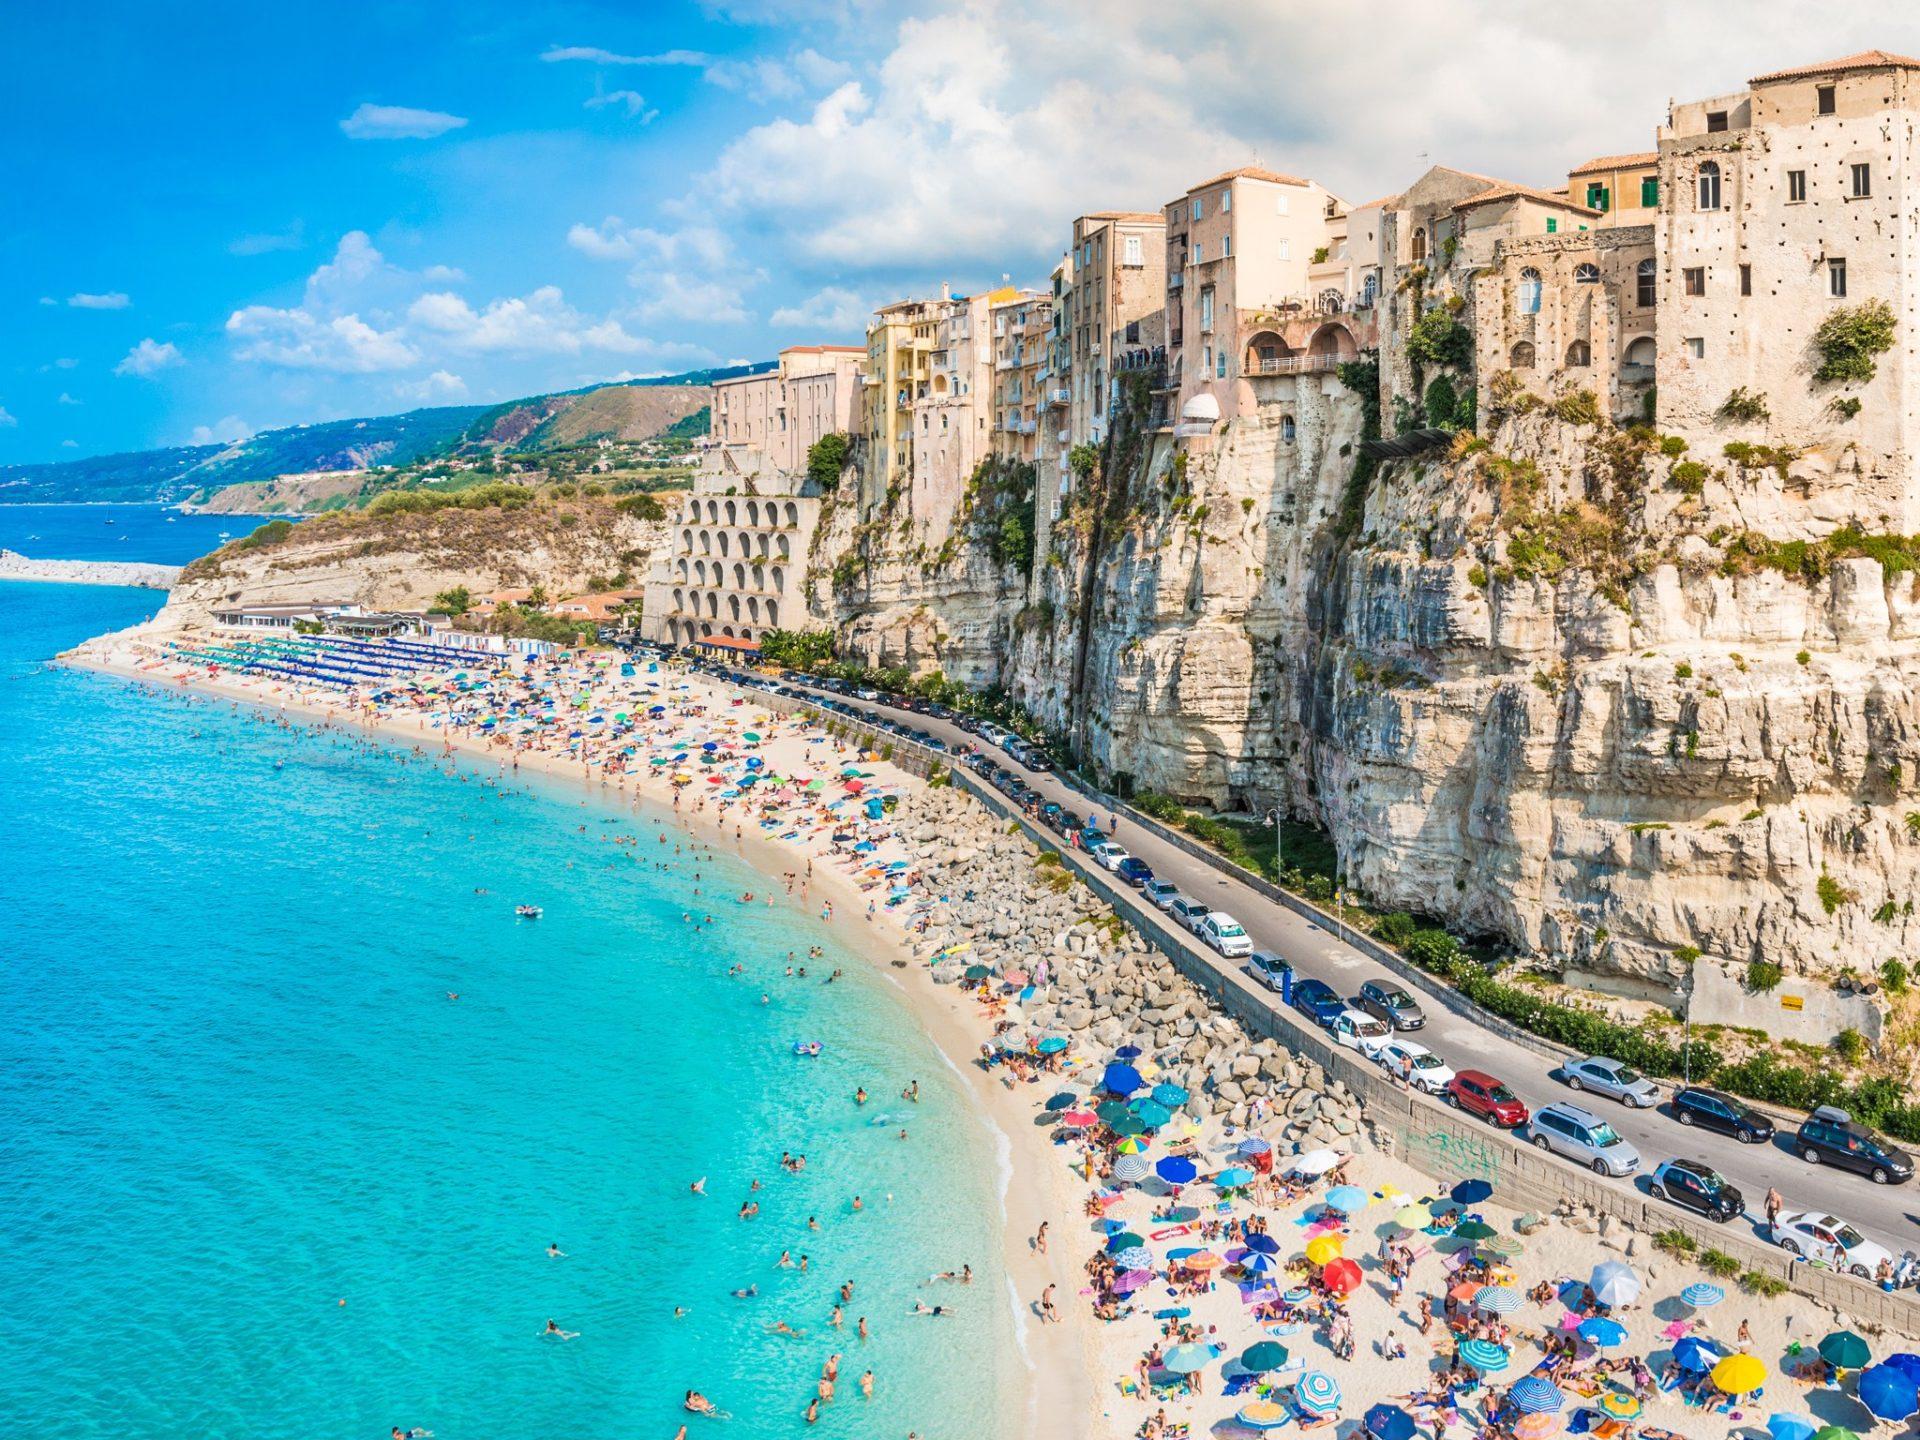 8. Пляж Марасуза, Тропея, Италия.